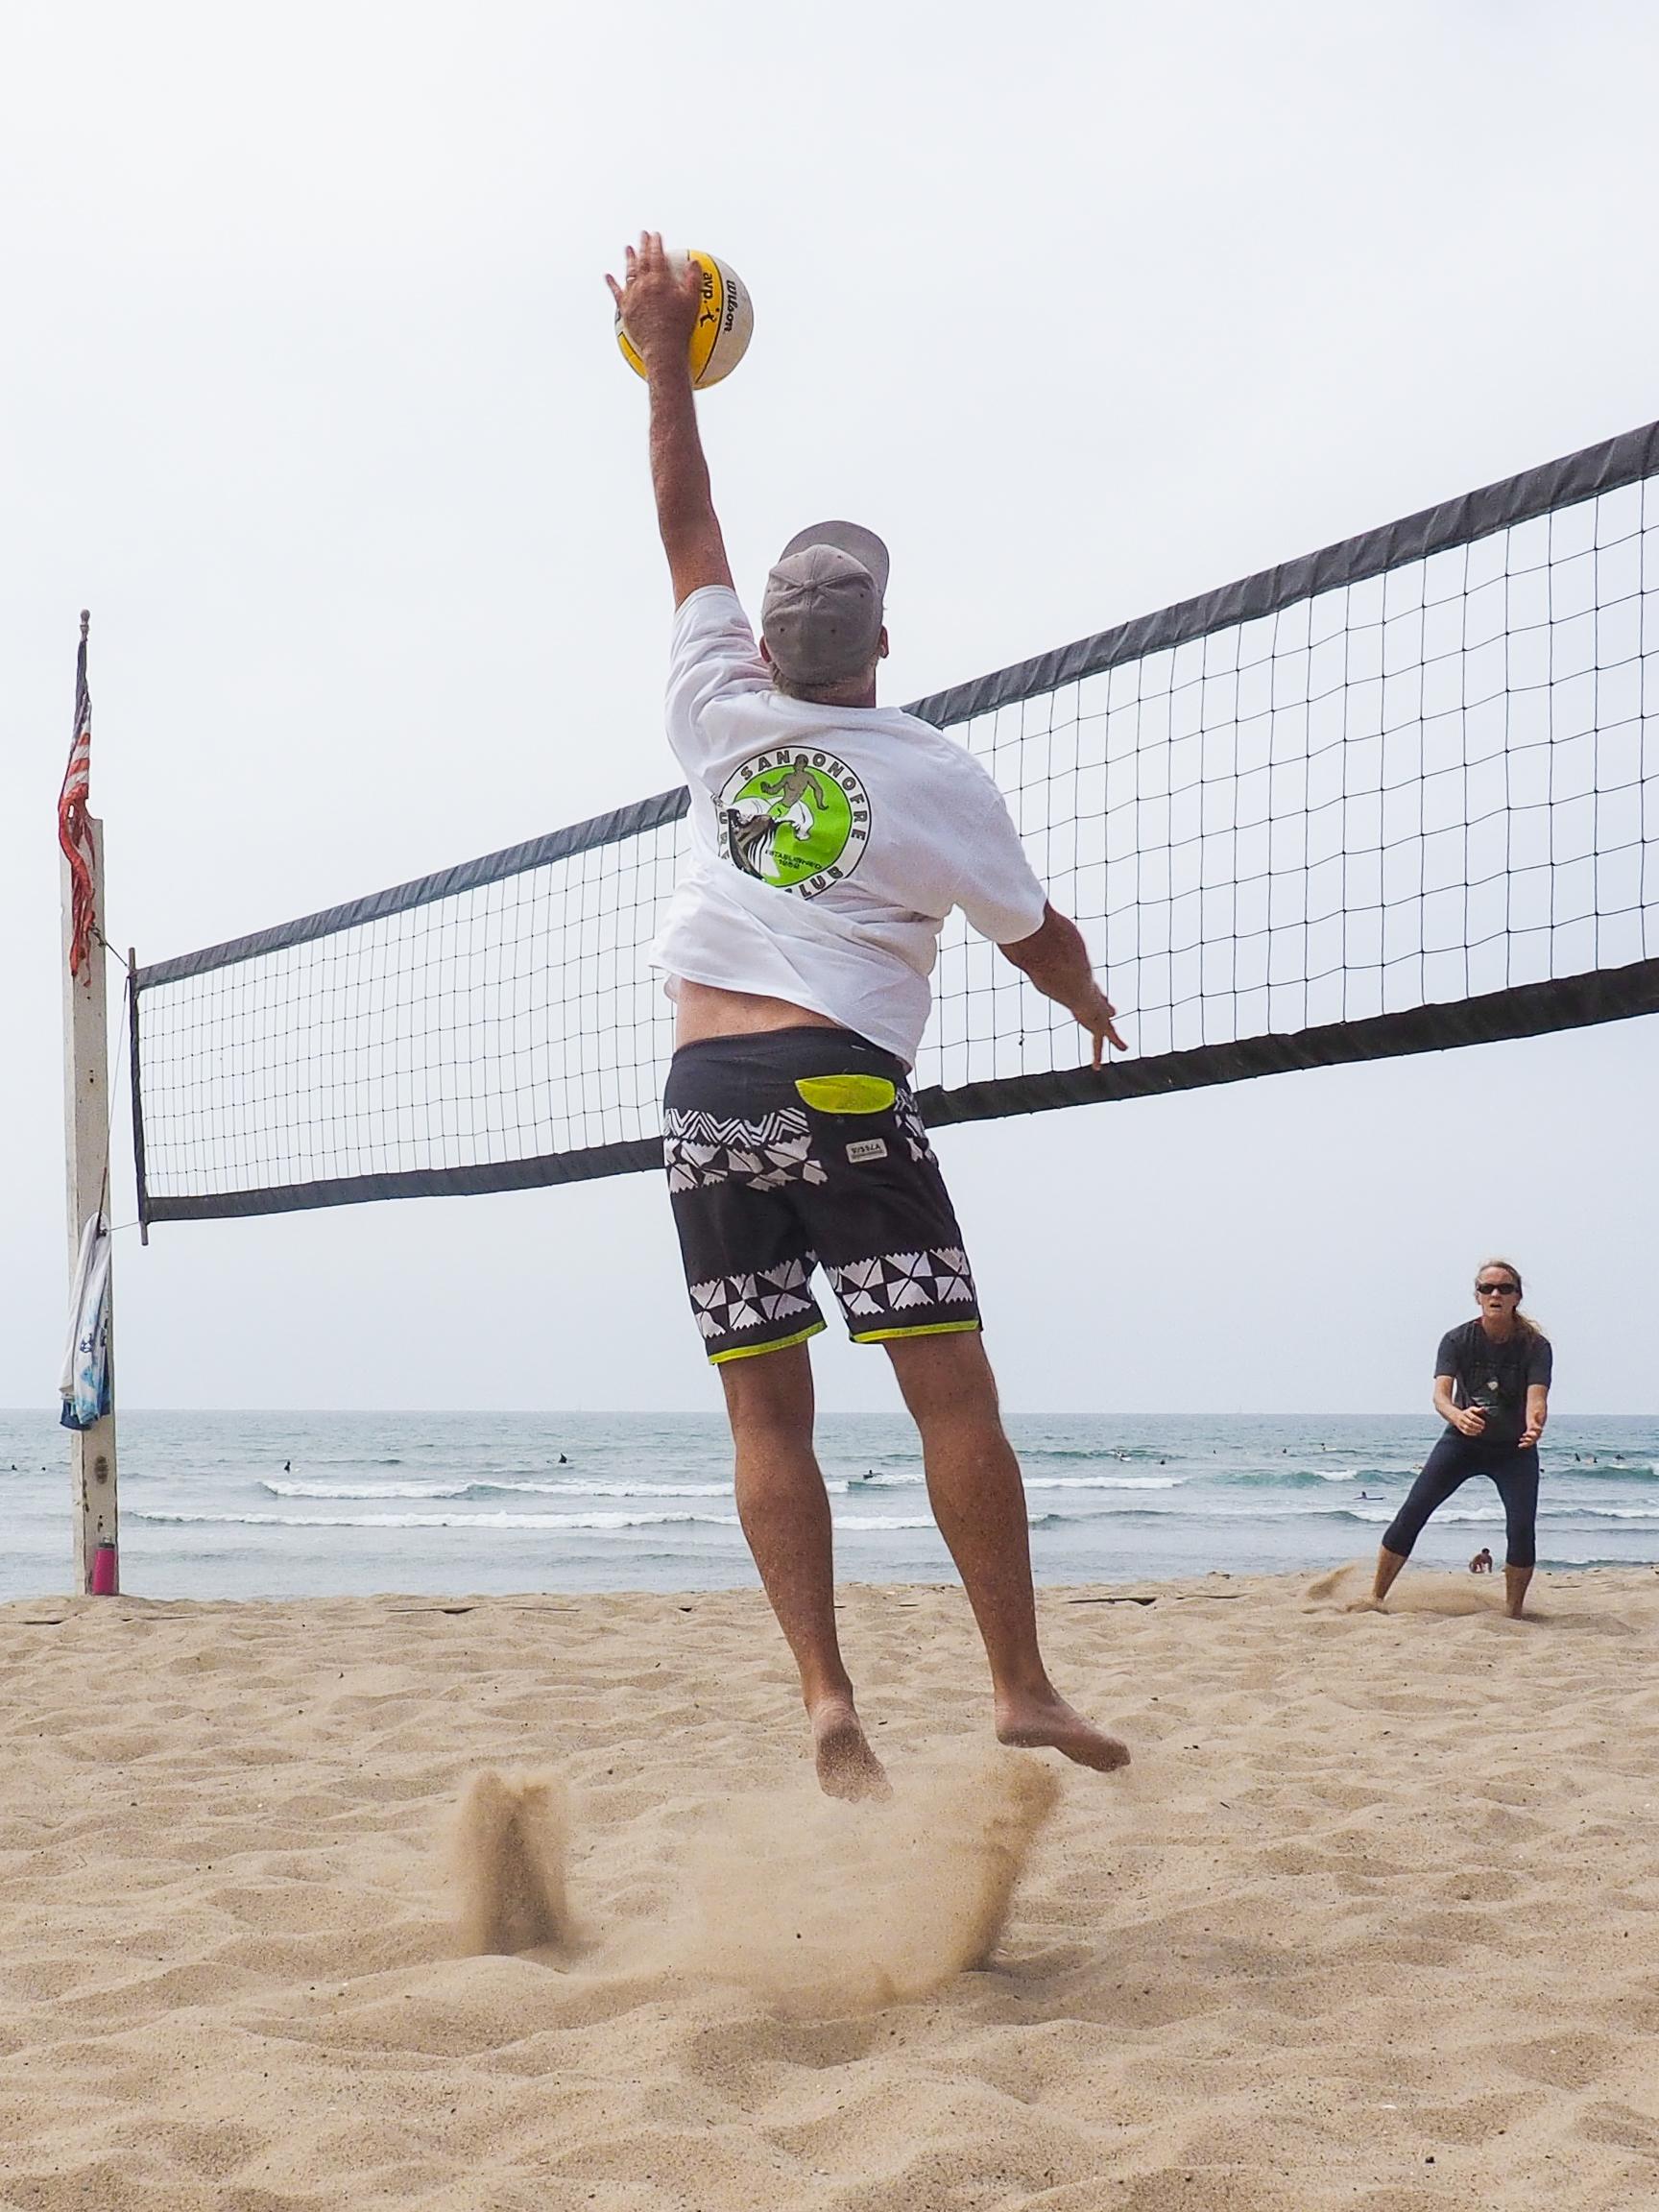 201808 vball beach SanO-83.jpg